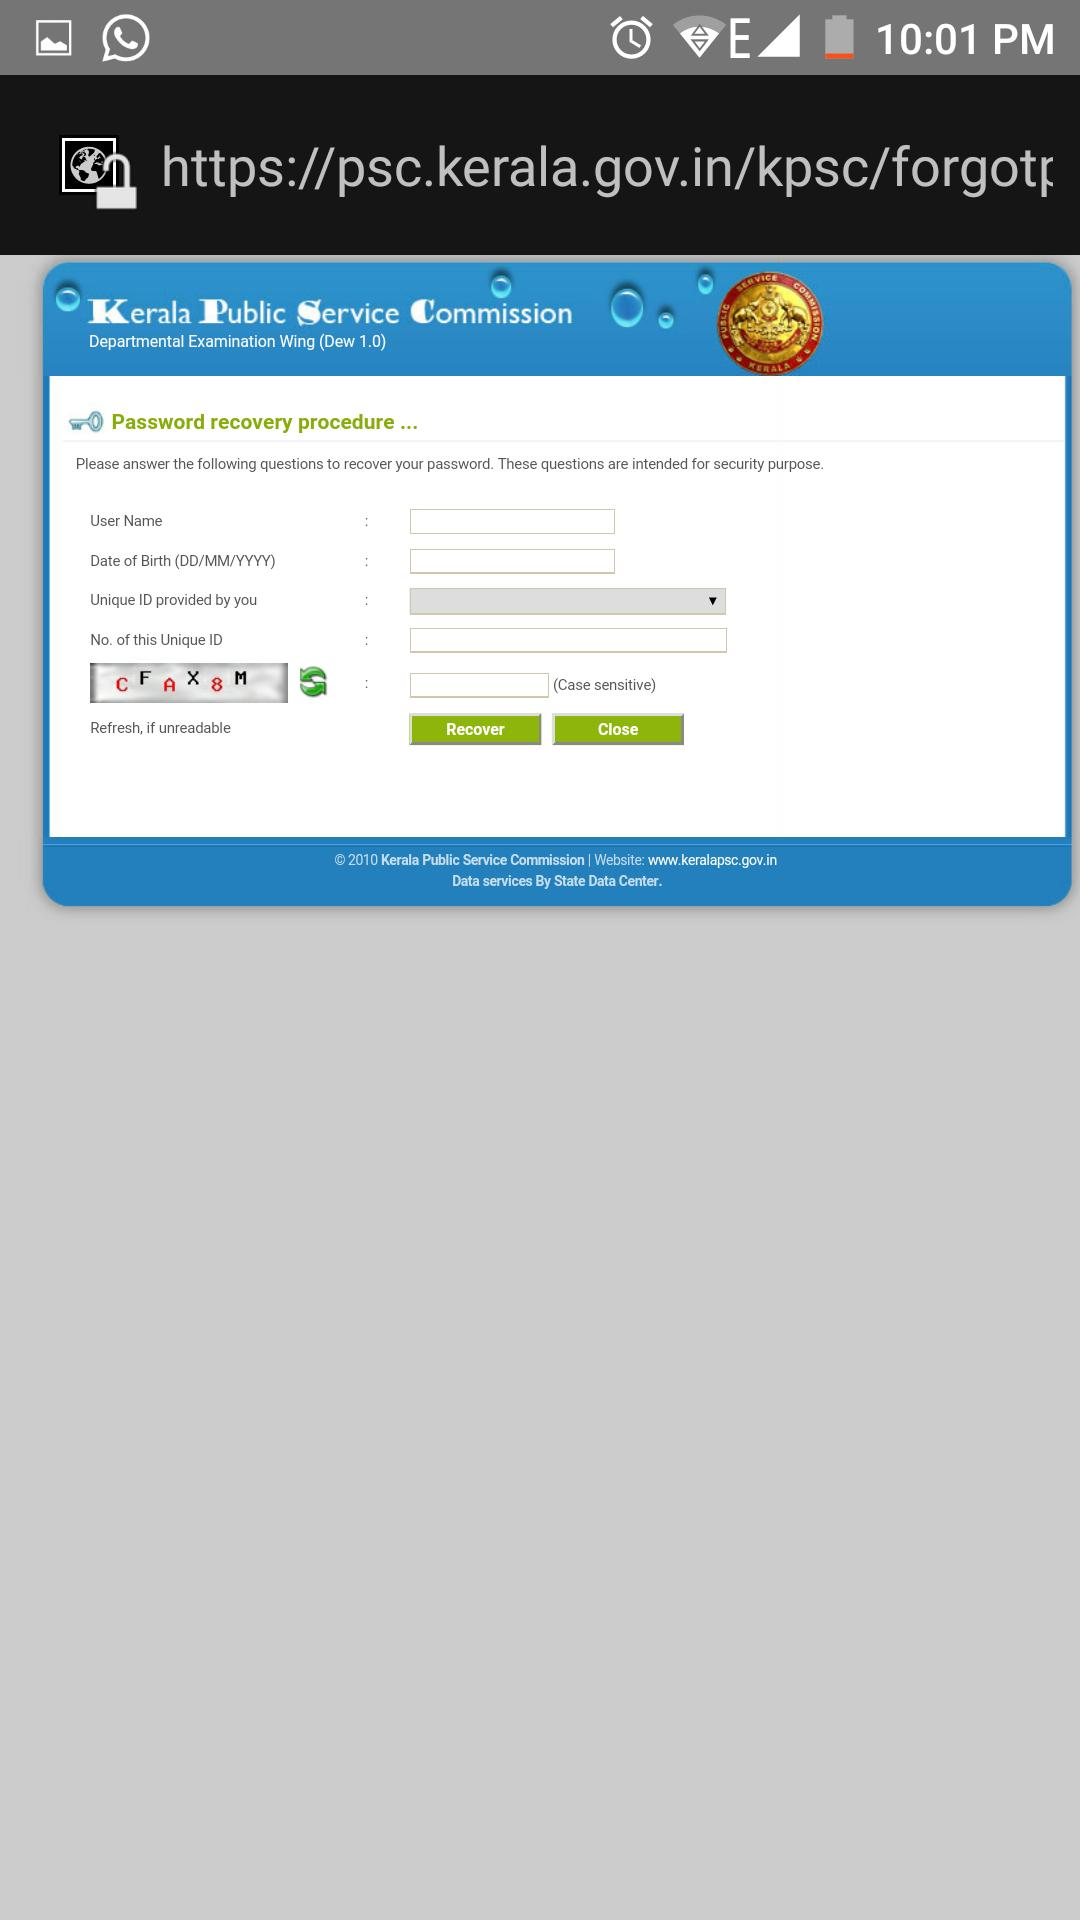 Public service login